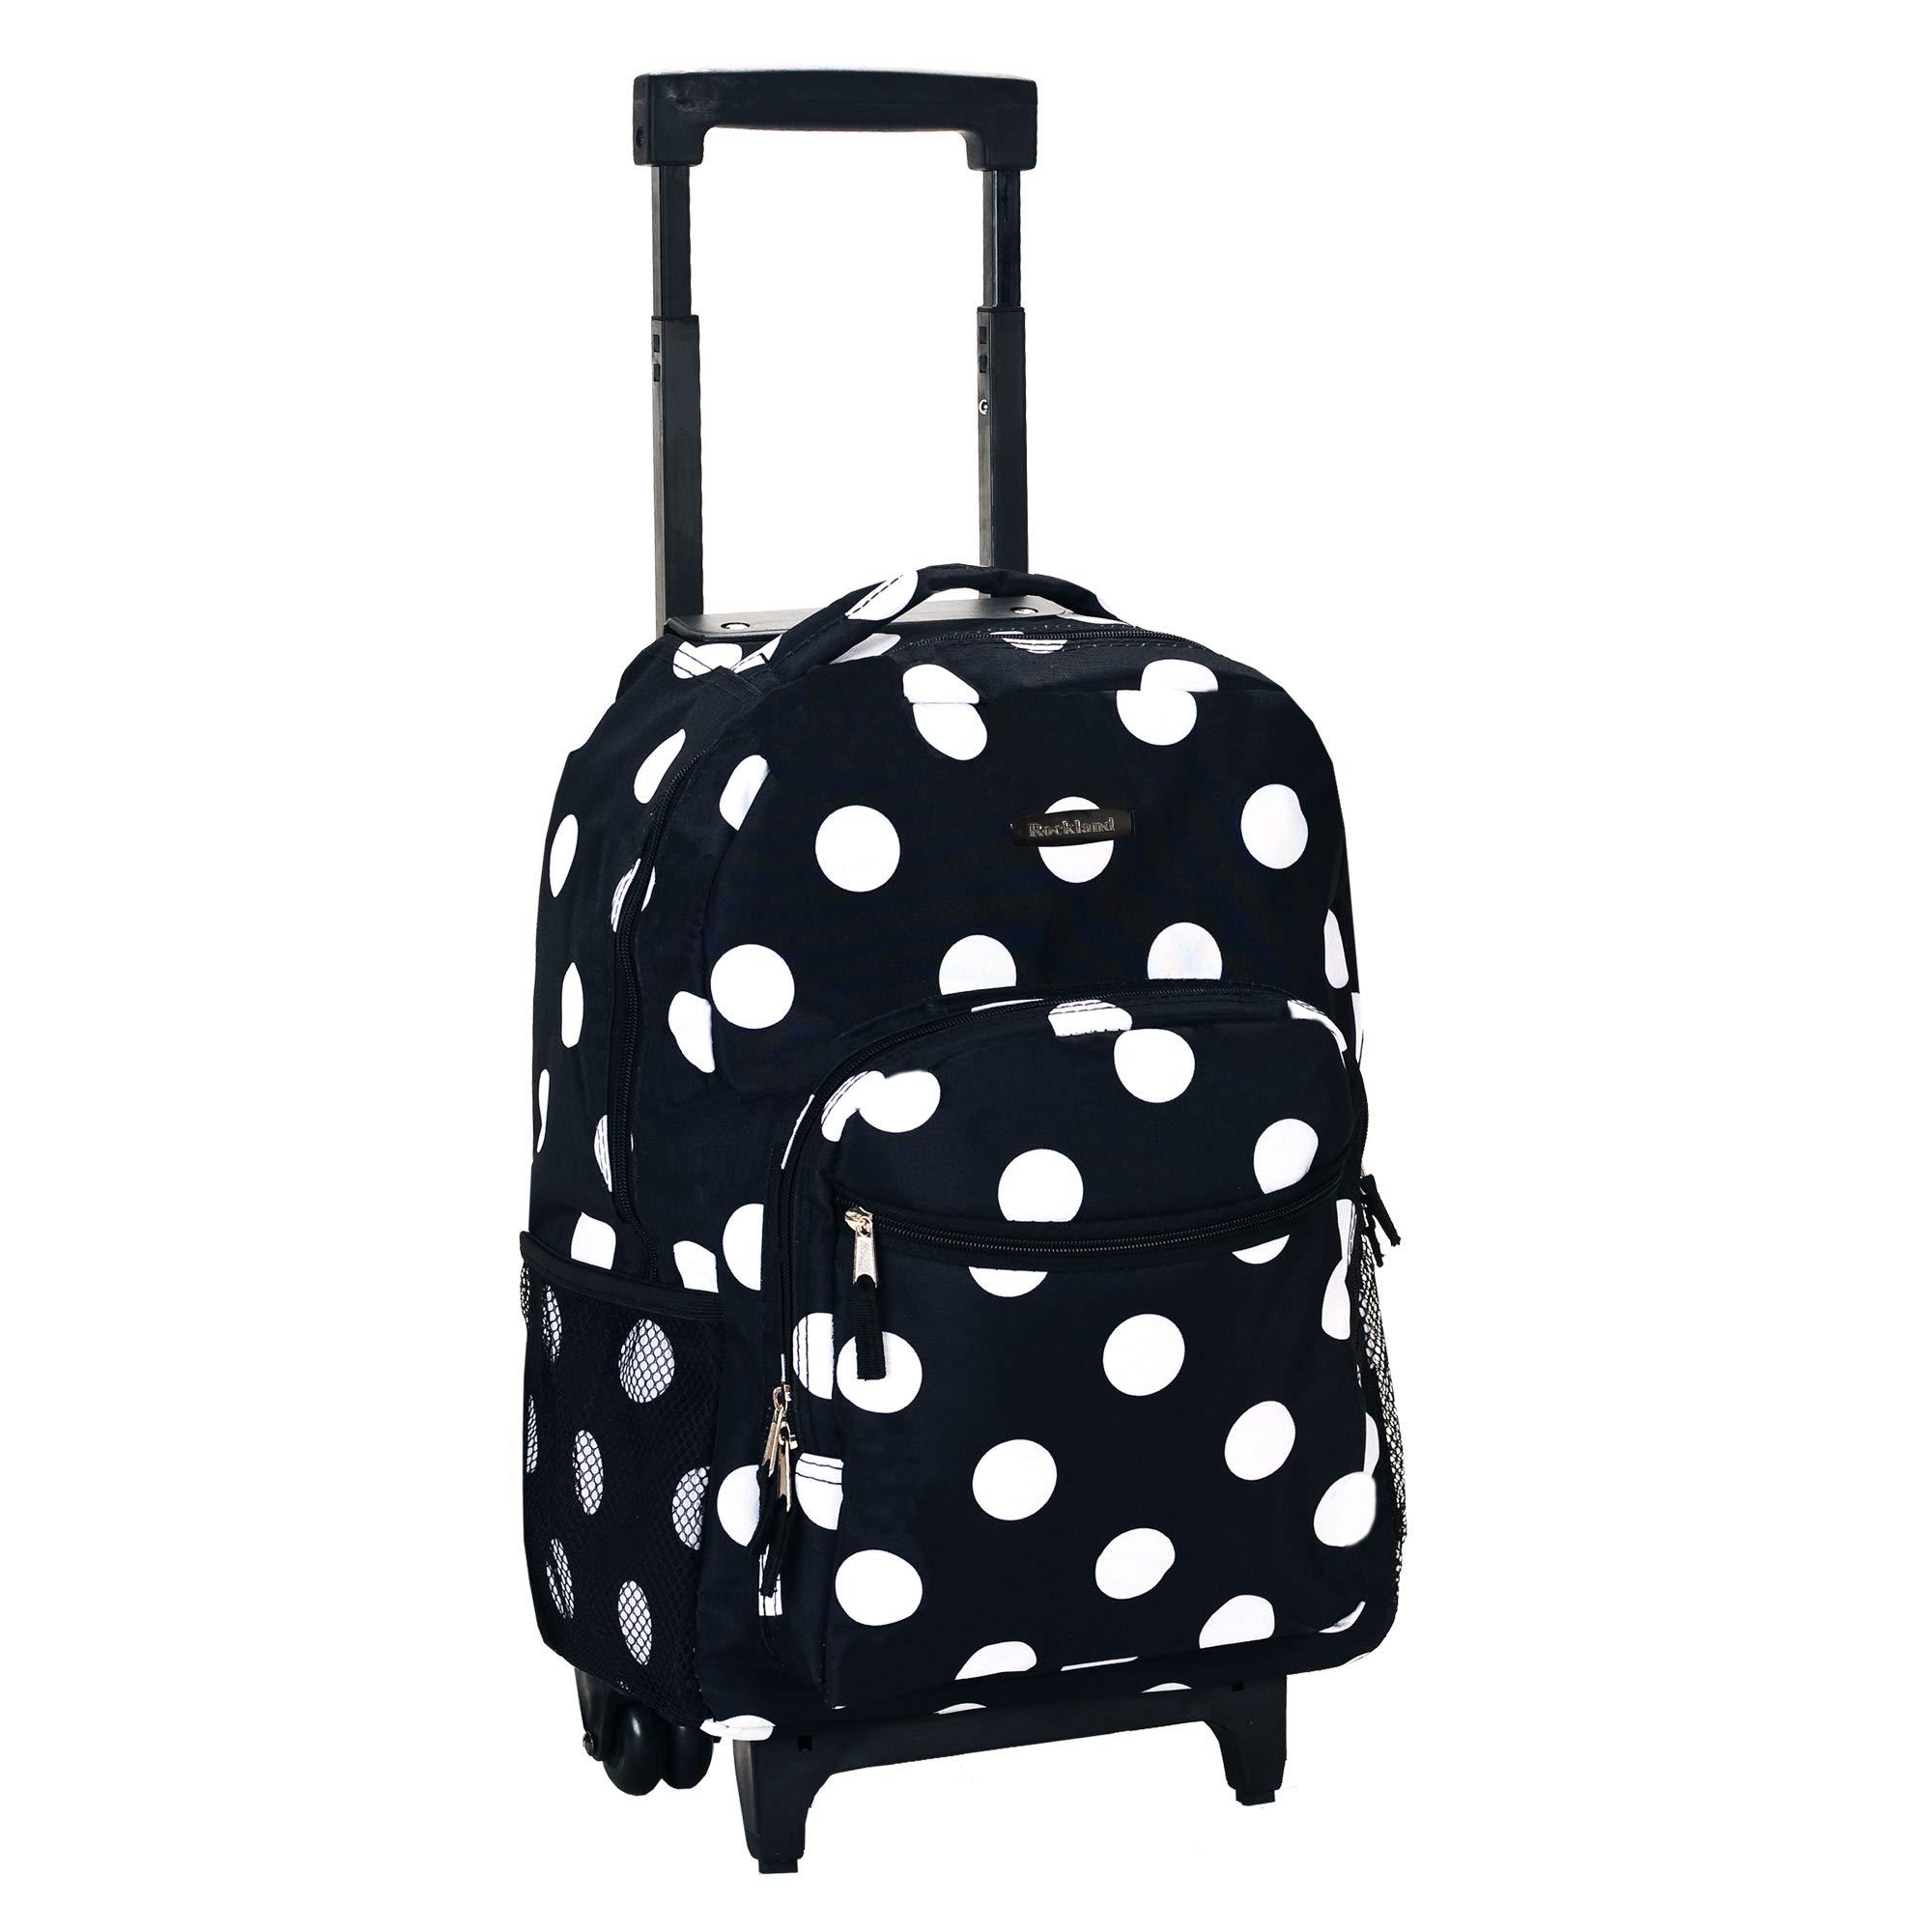 Rockland Luggage 17 Inch Rolling Backpack, Black Dot, Medium